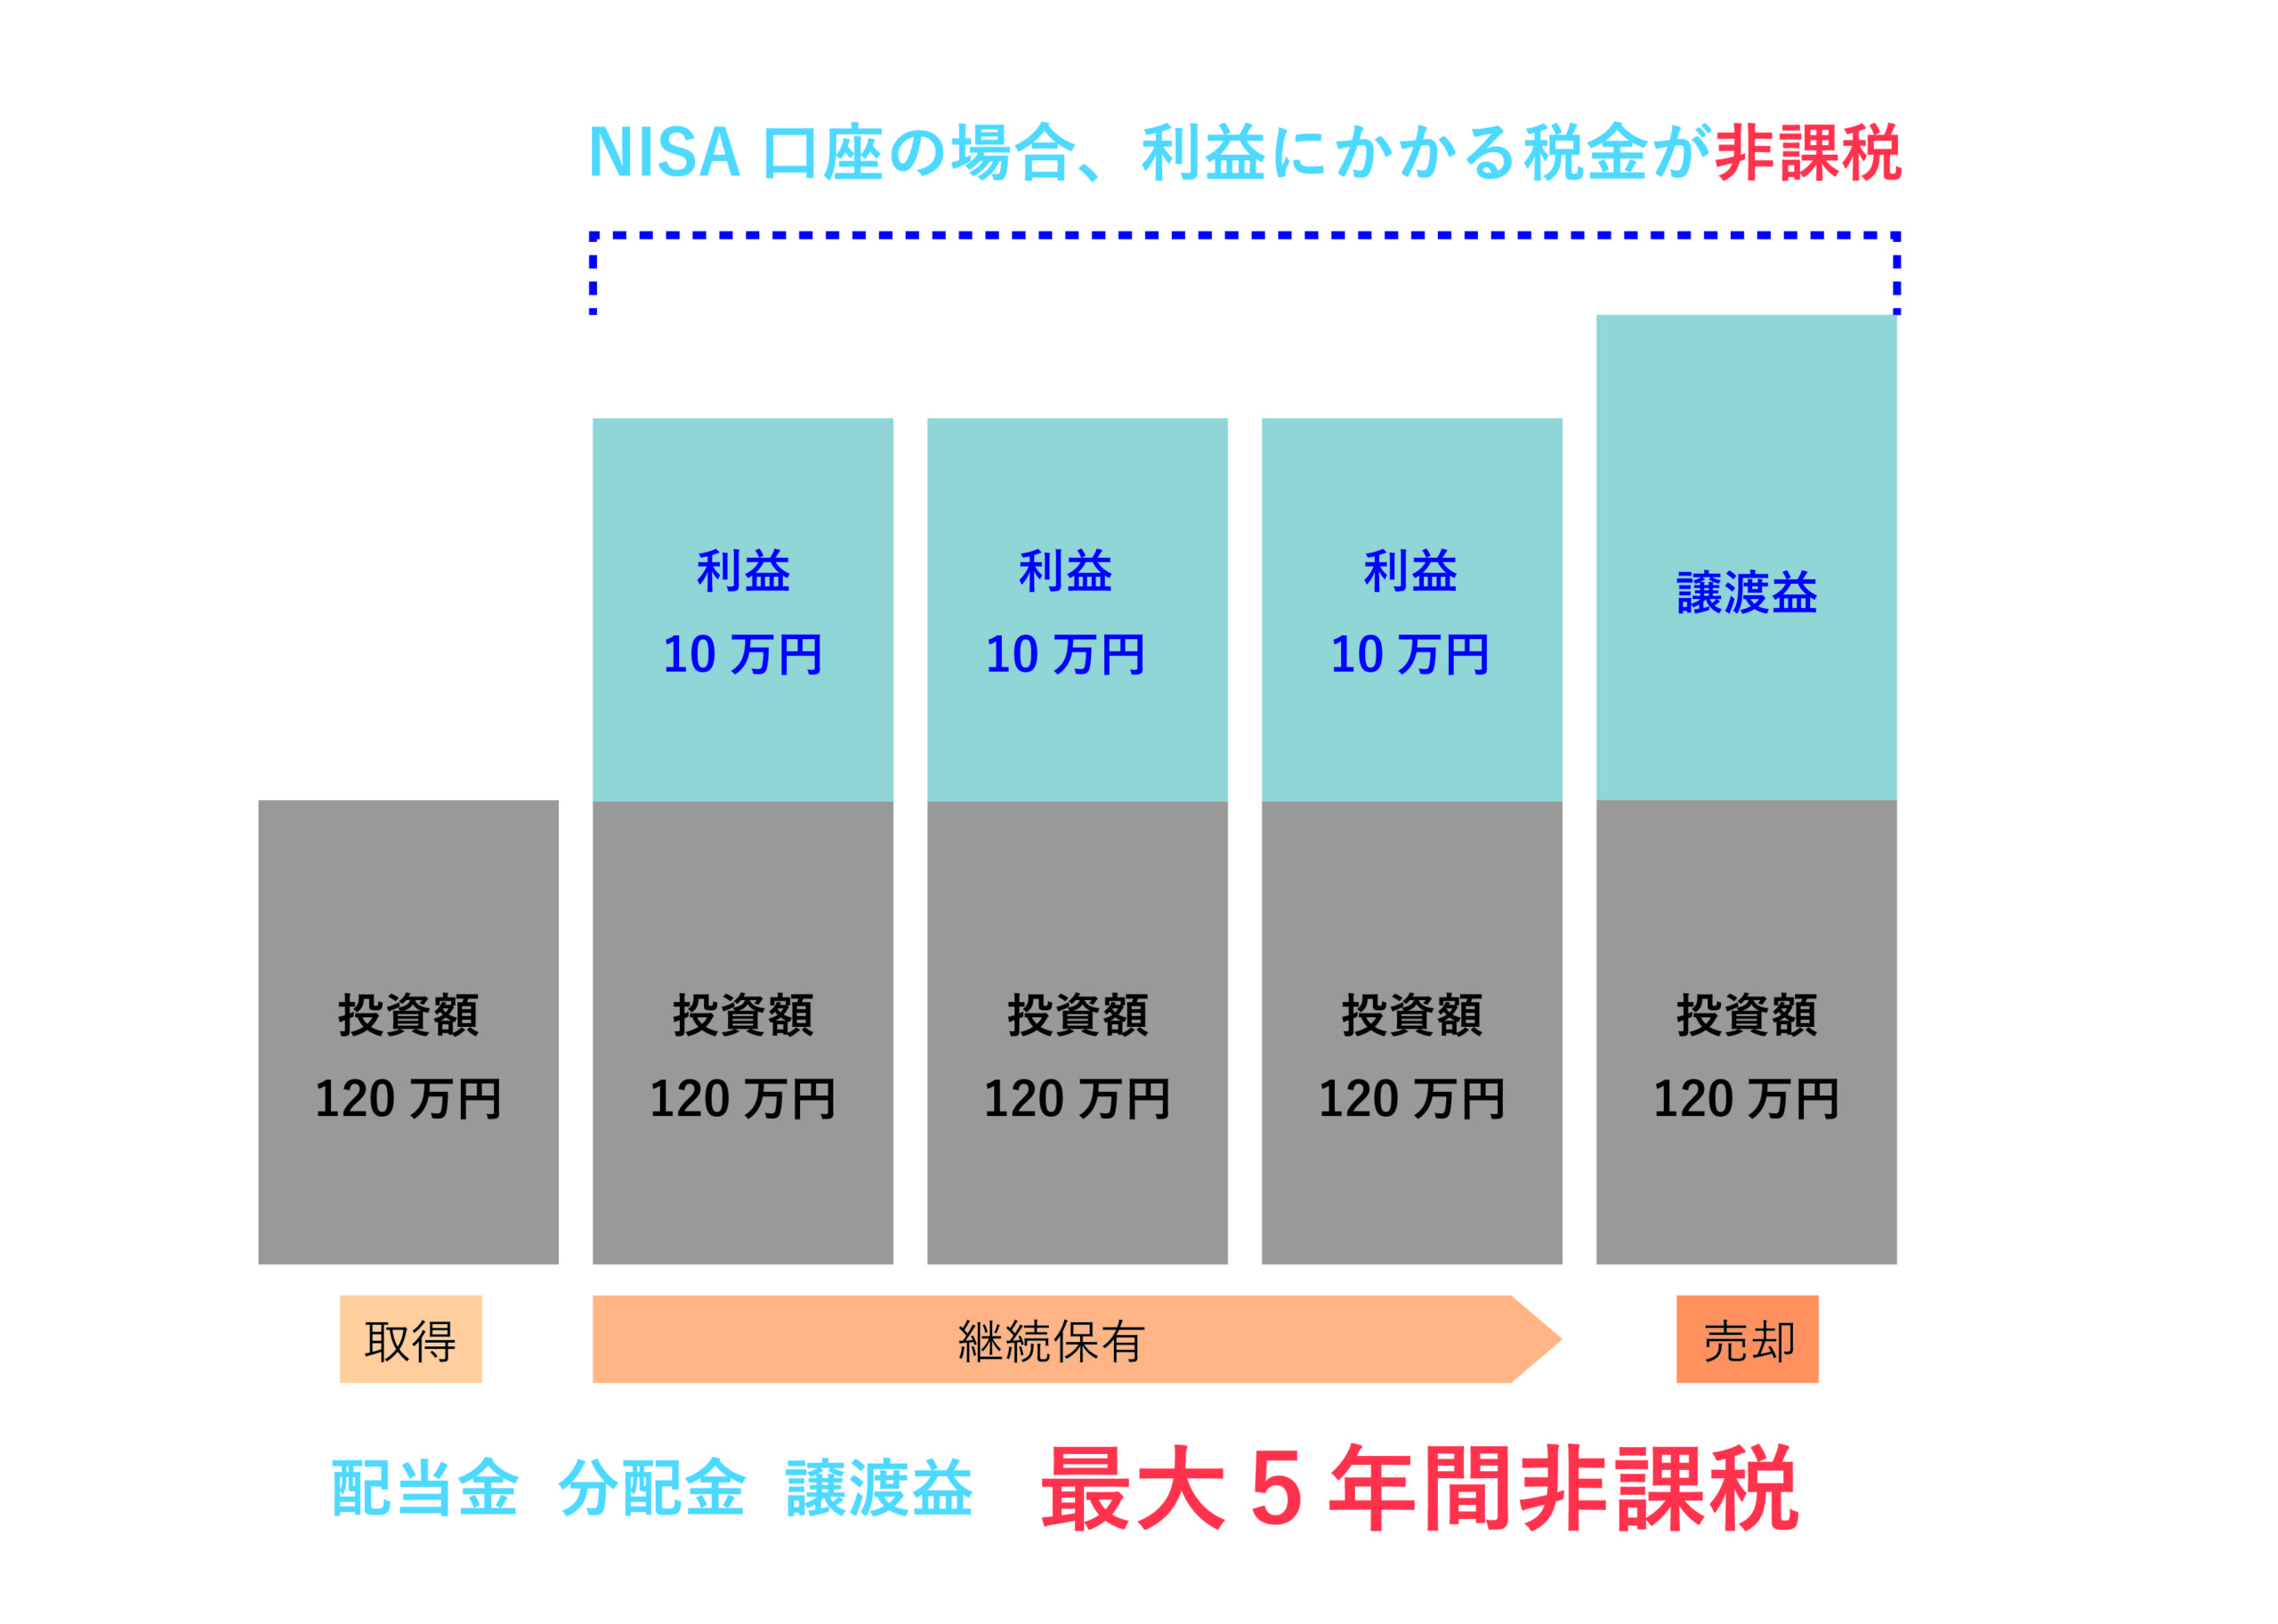 NISA口座なら利益が一定期間非課税